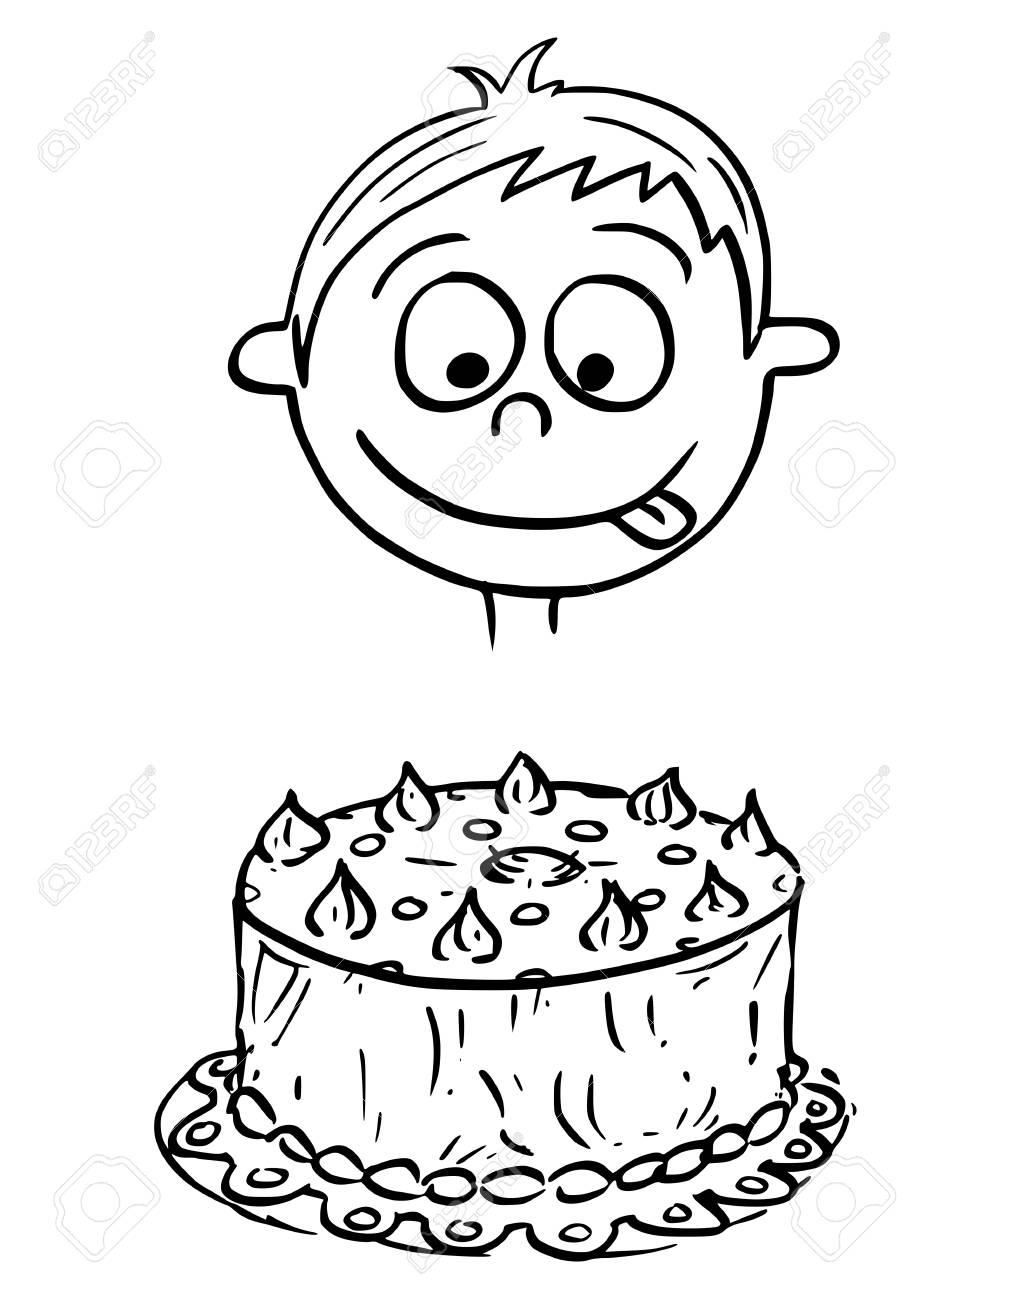 Hand Drawing Cartoon Vector Illustration Of Boy Looking At Birthday